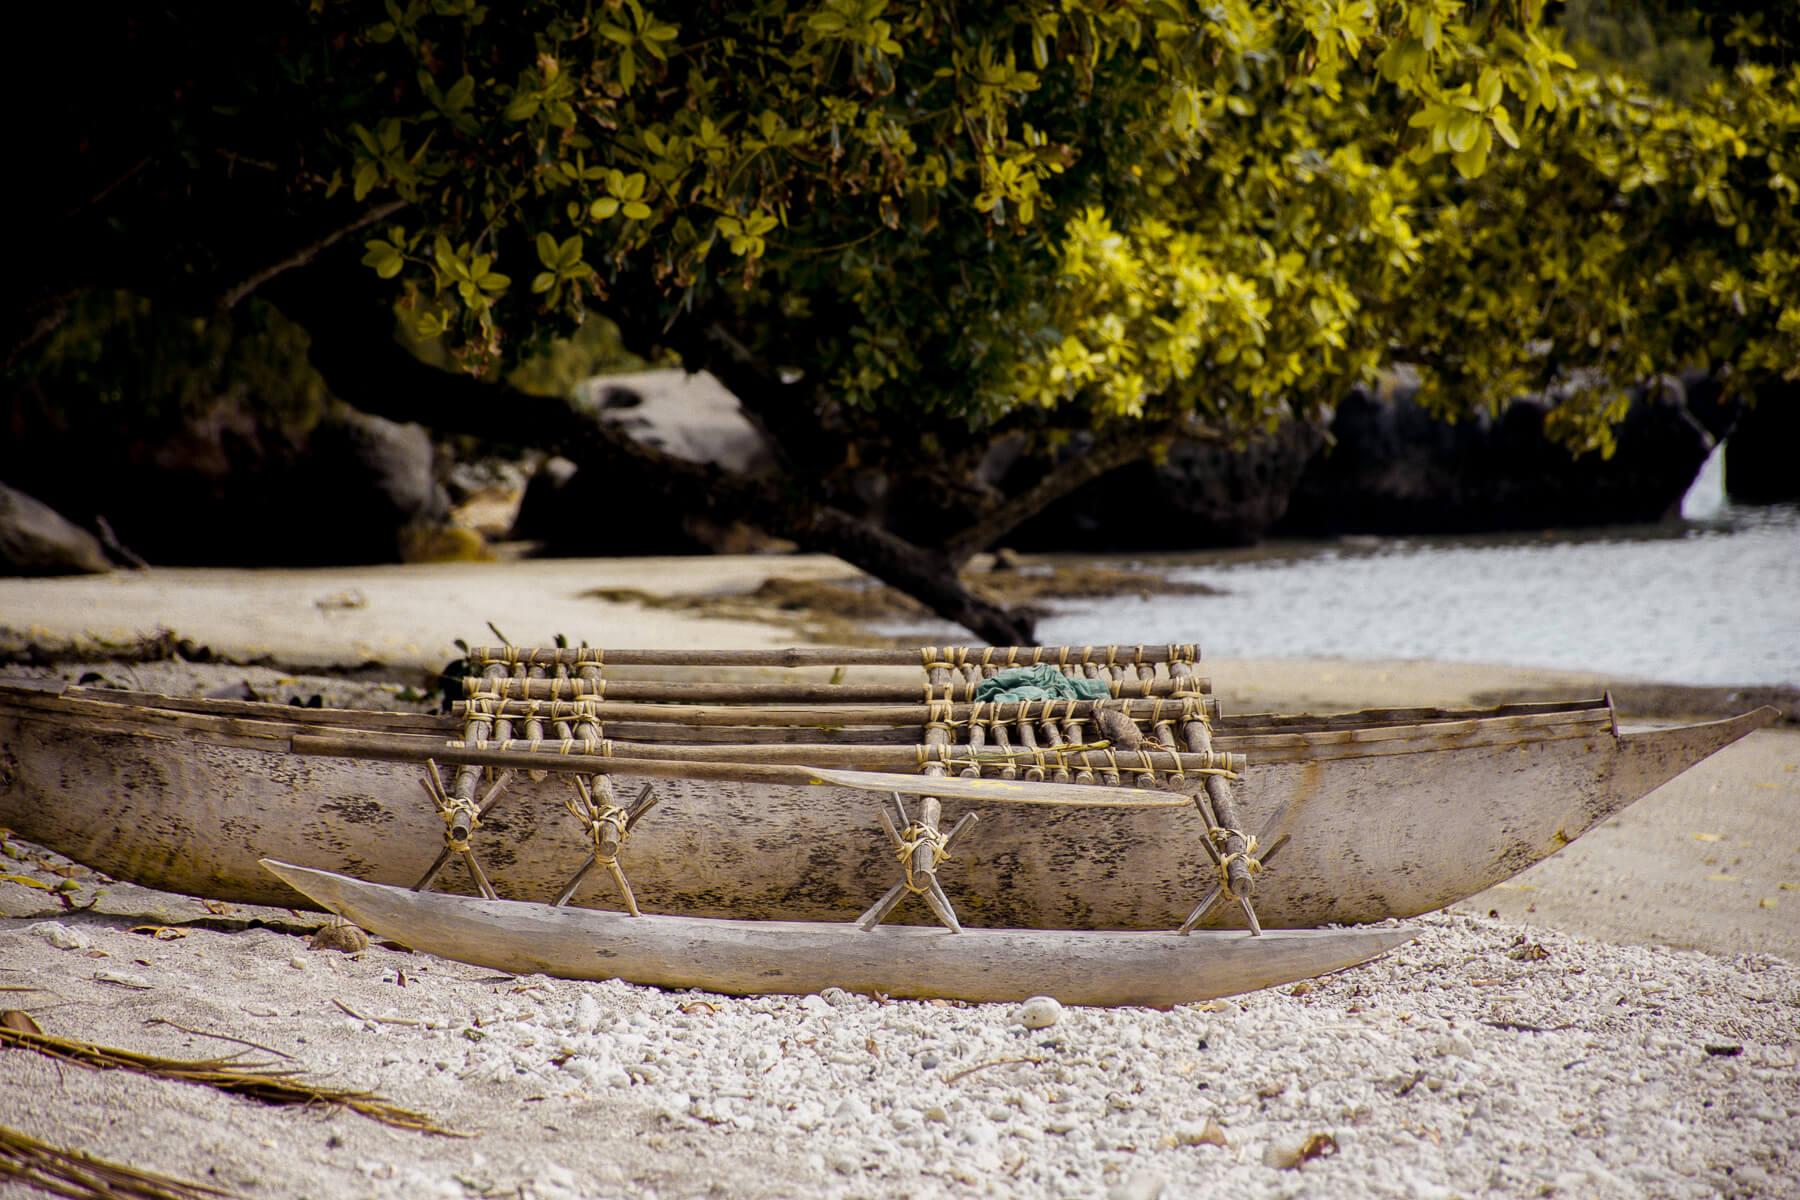 A traditional Vanuatu Canoe on the beach